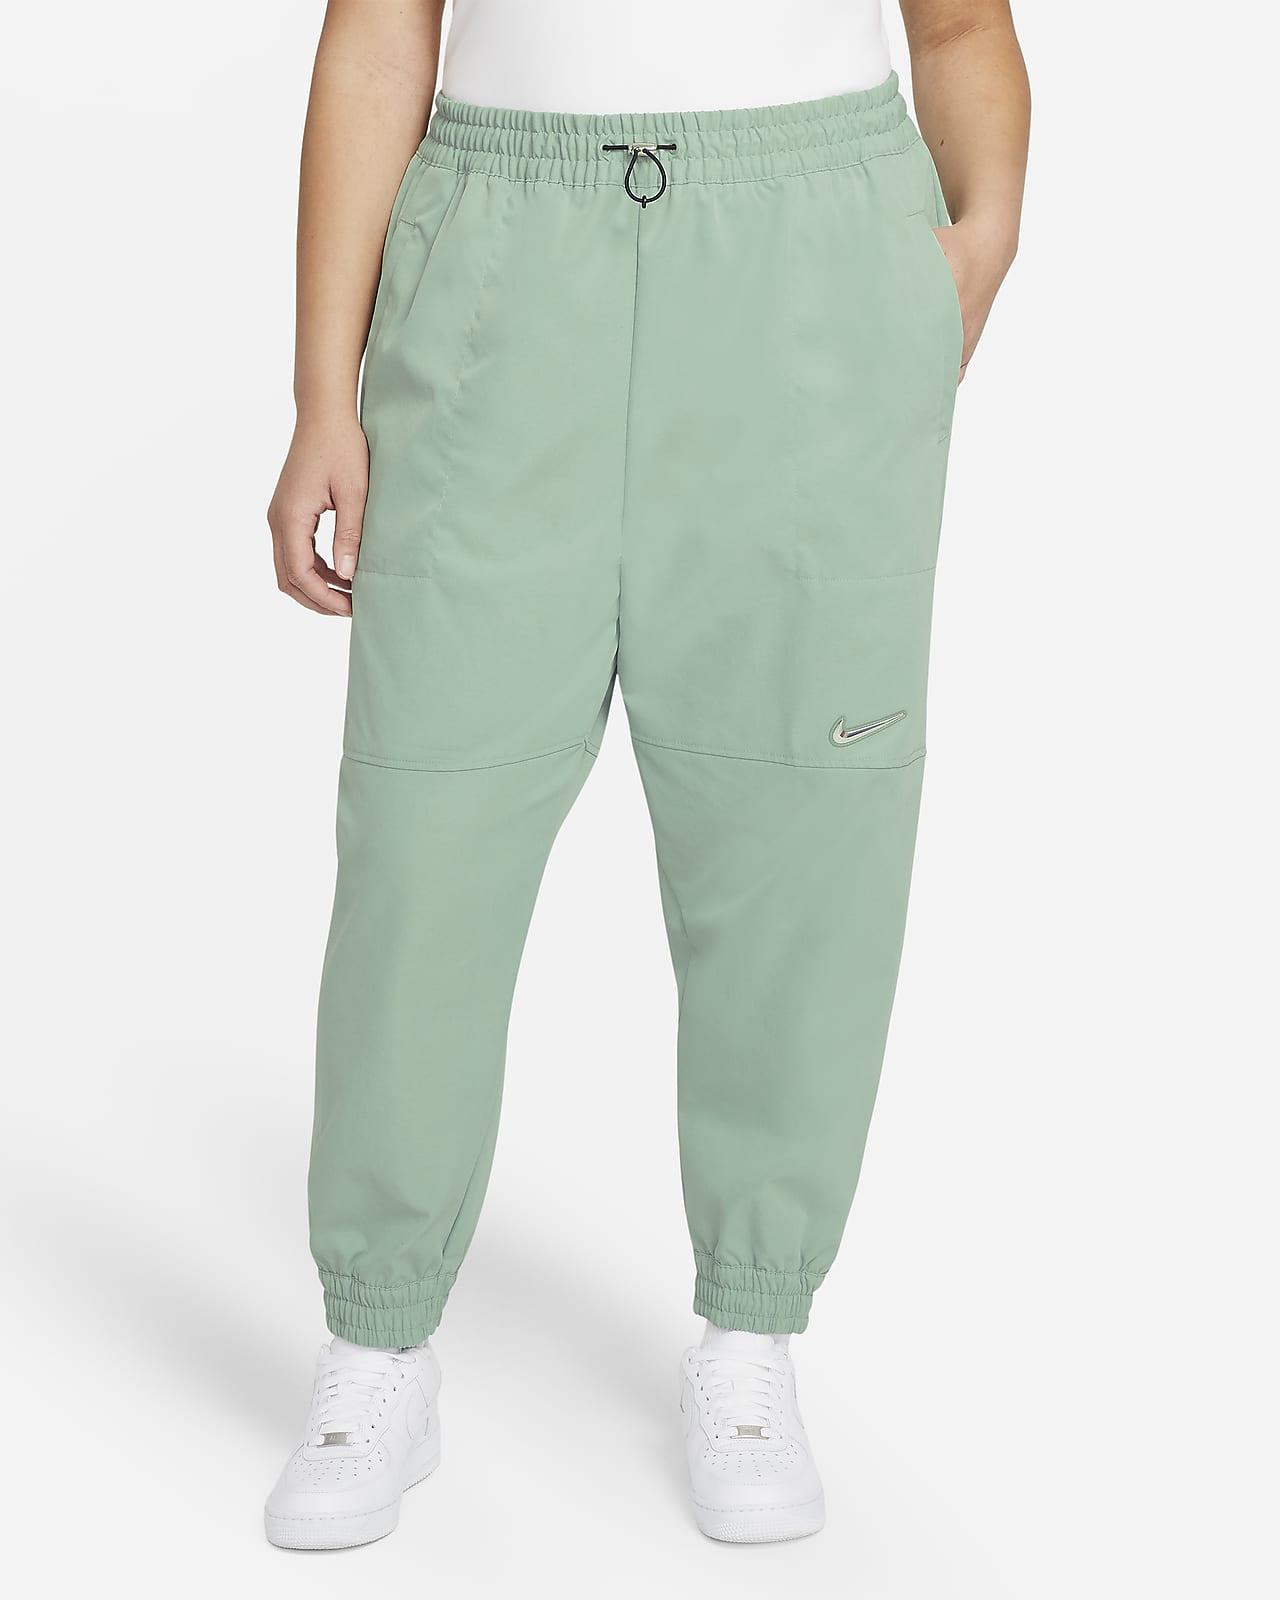 Pantalones para mujer (talla grande) Nike Sportswear Swoosh